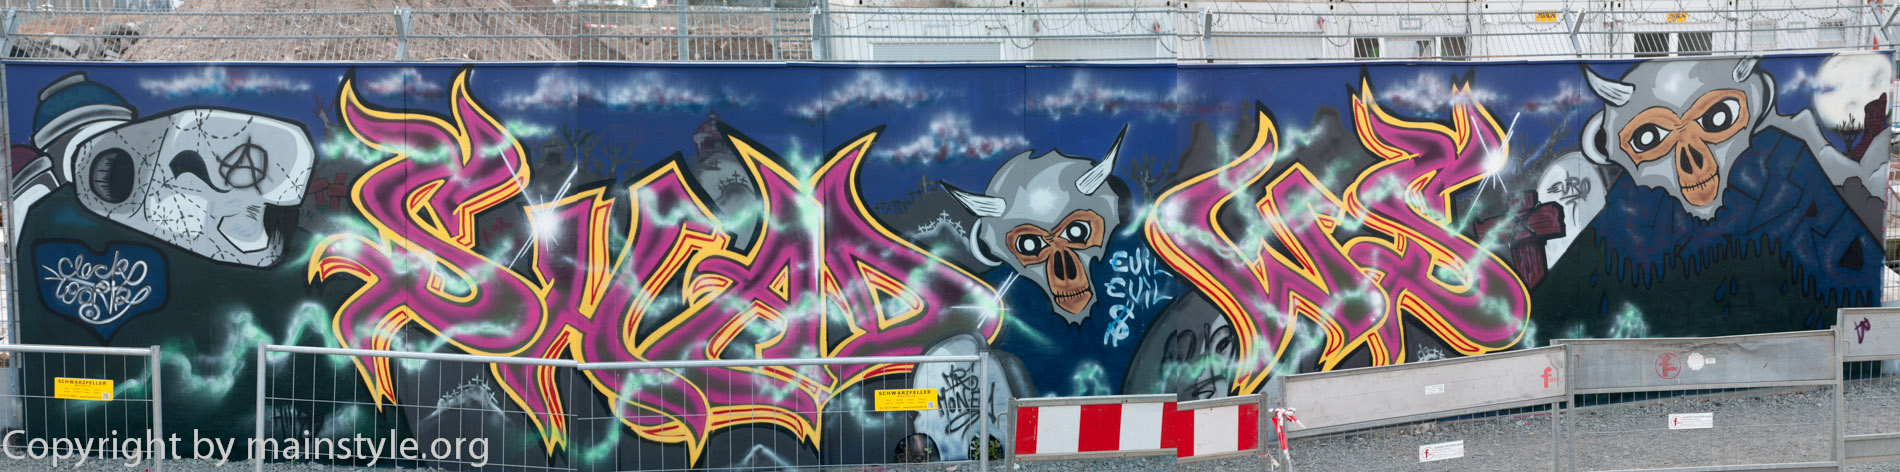 Frankfurt_Nacht_der_Museen_Graffiti_EZB_2013_Part3_full--5